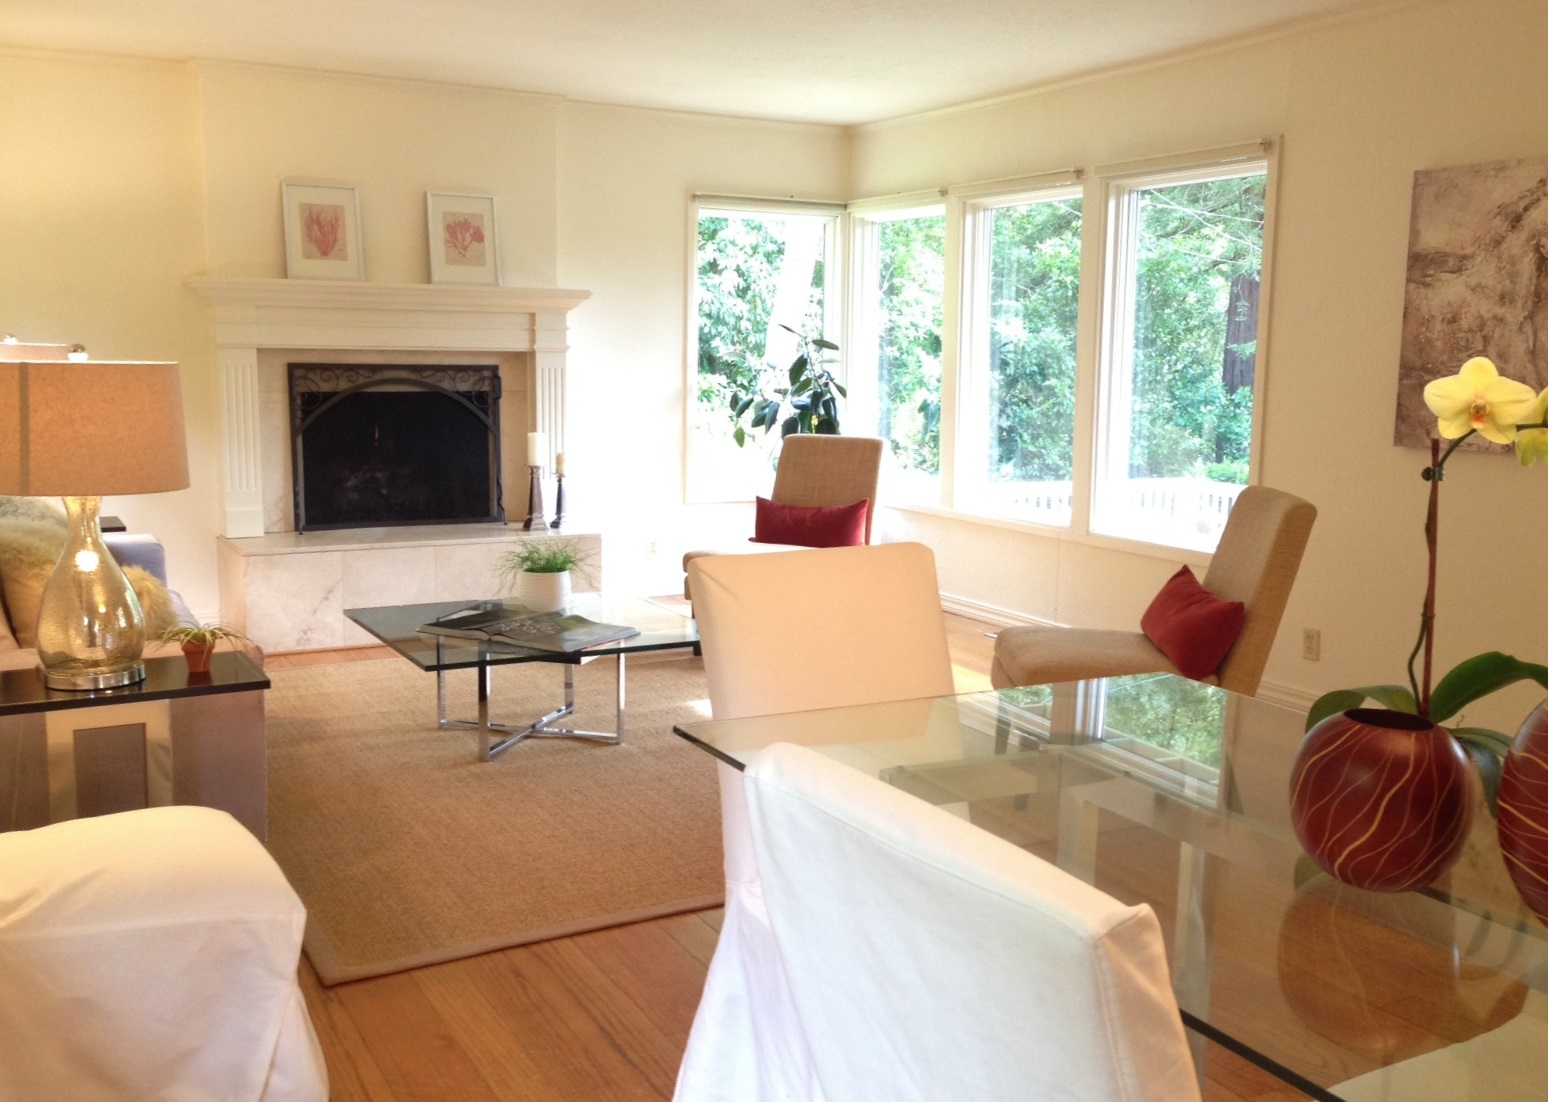 242 Manor Drive,Mill Valley,California 94941,3 Bedrooms Bedrooms,2 BathroomsBathrooms,Single Family Home,Manor Drive,1001